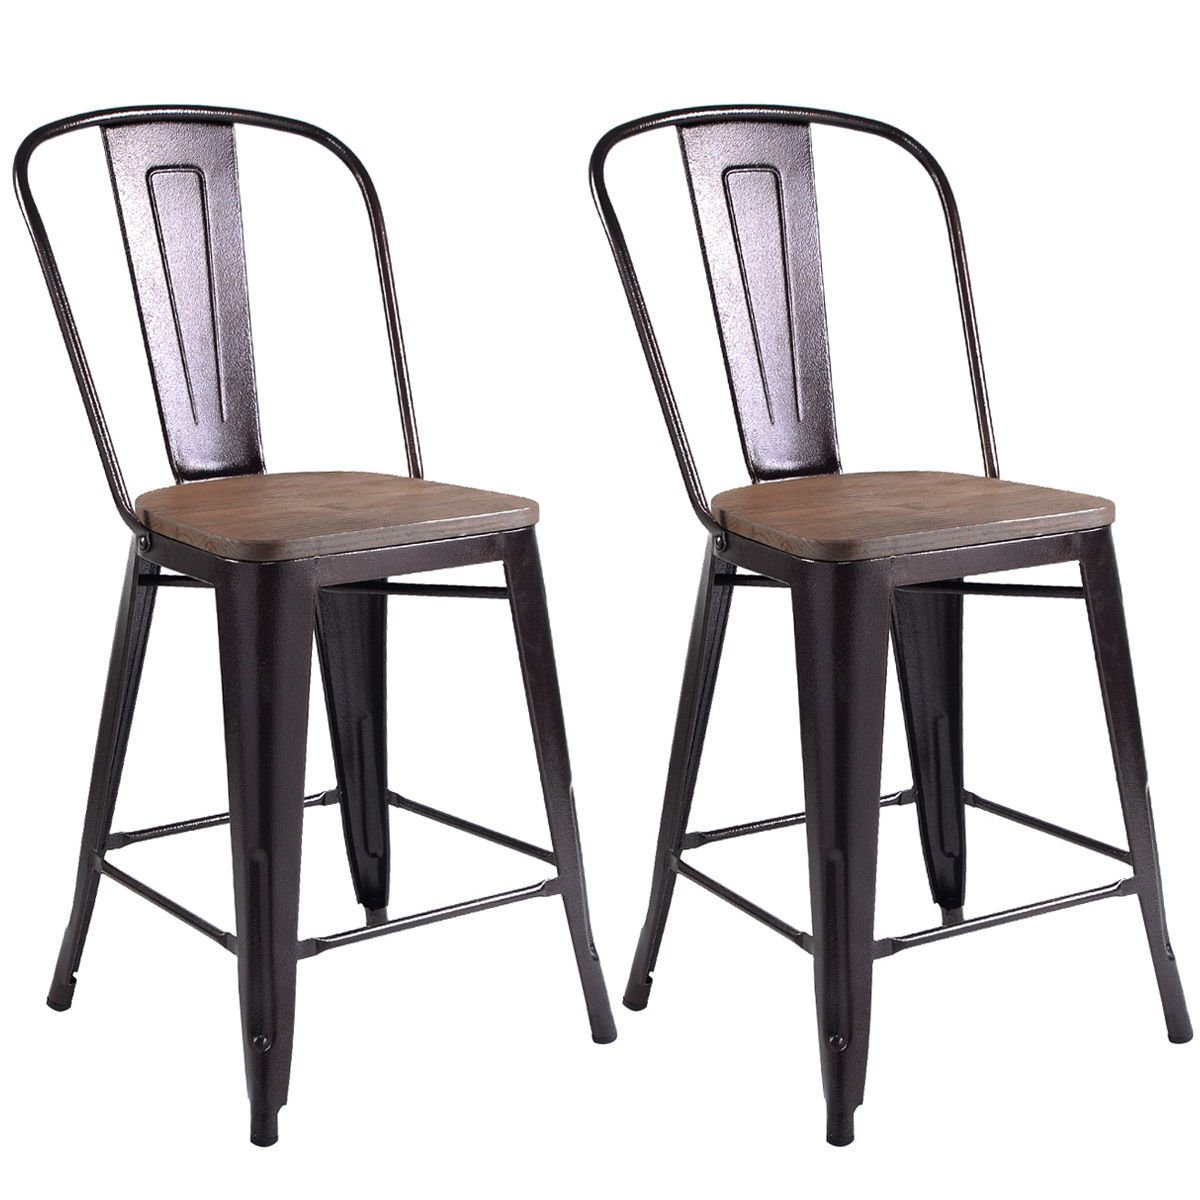 Rustic Bar Chairs: Amazon.com